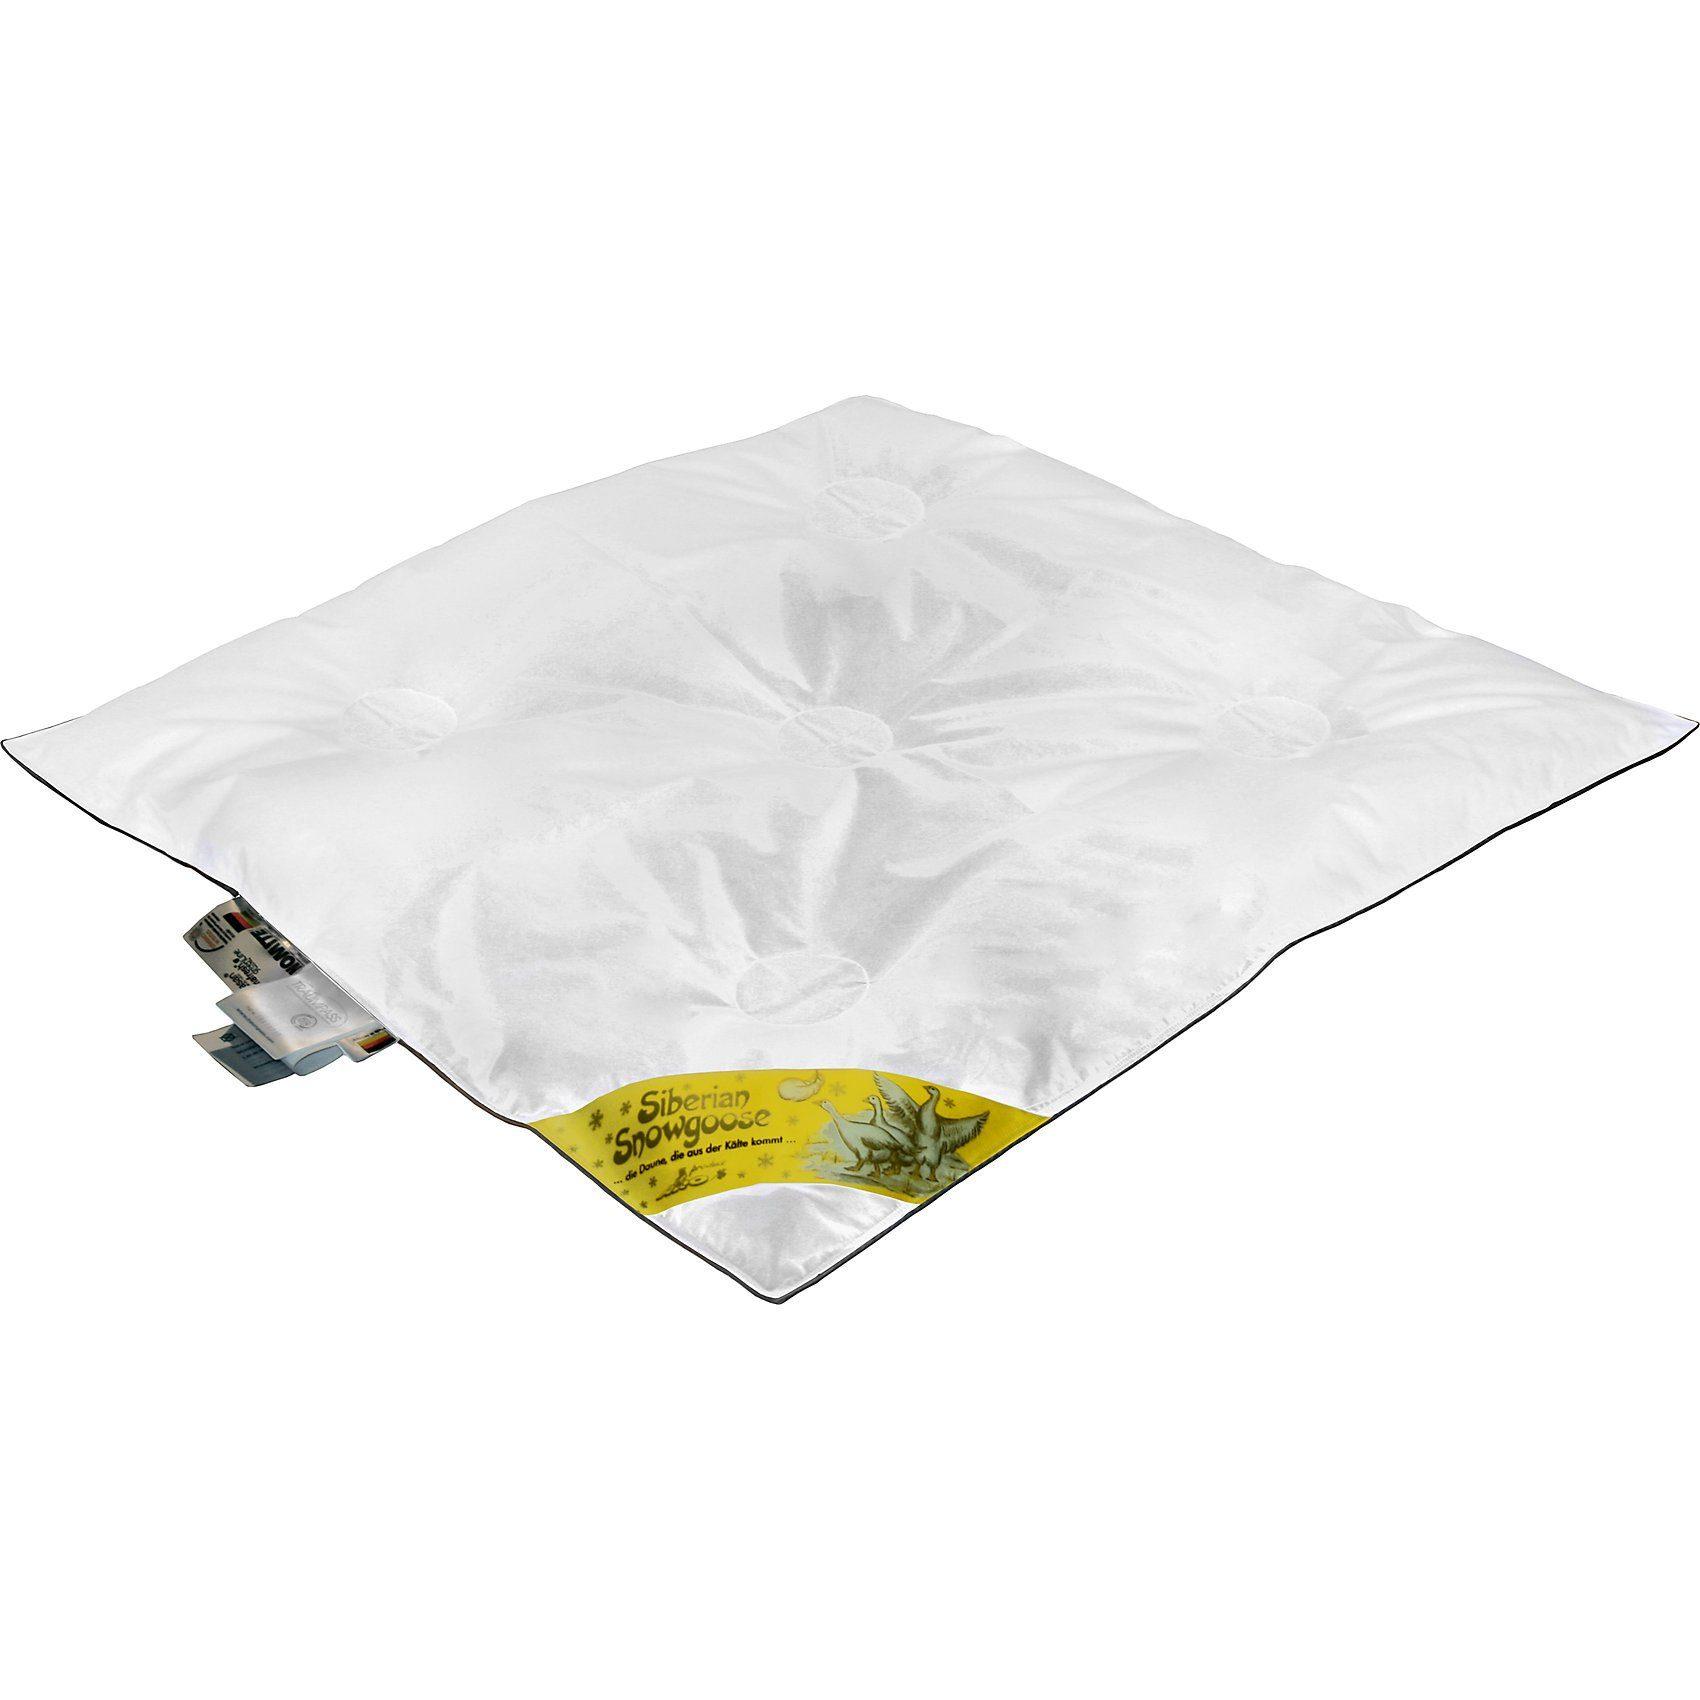 Artländer Baby Bettdecke, Klimakammern, Daunen (100%), 80 x 80 cm